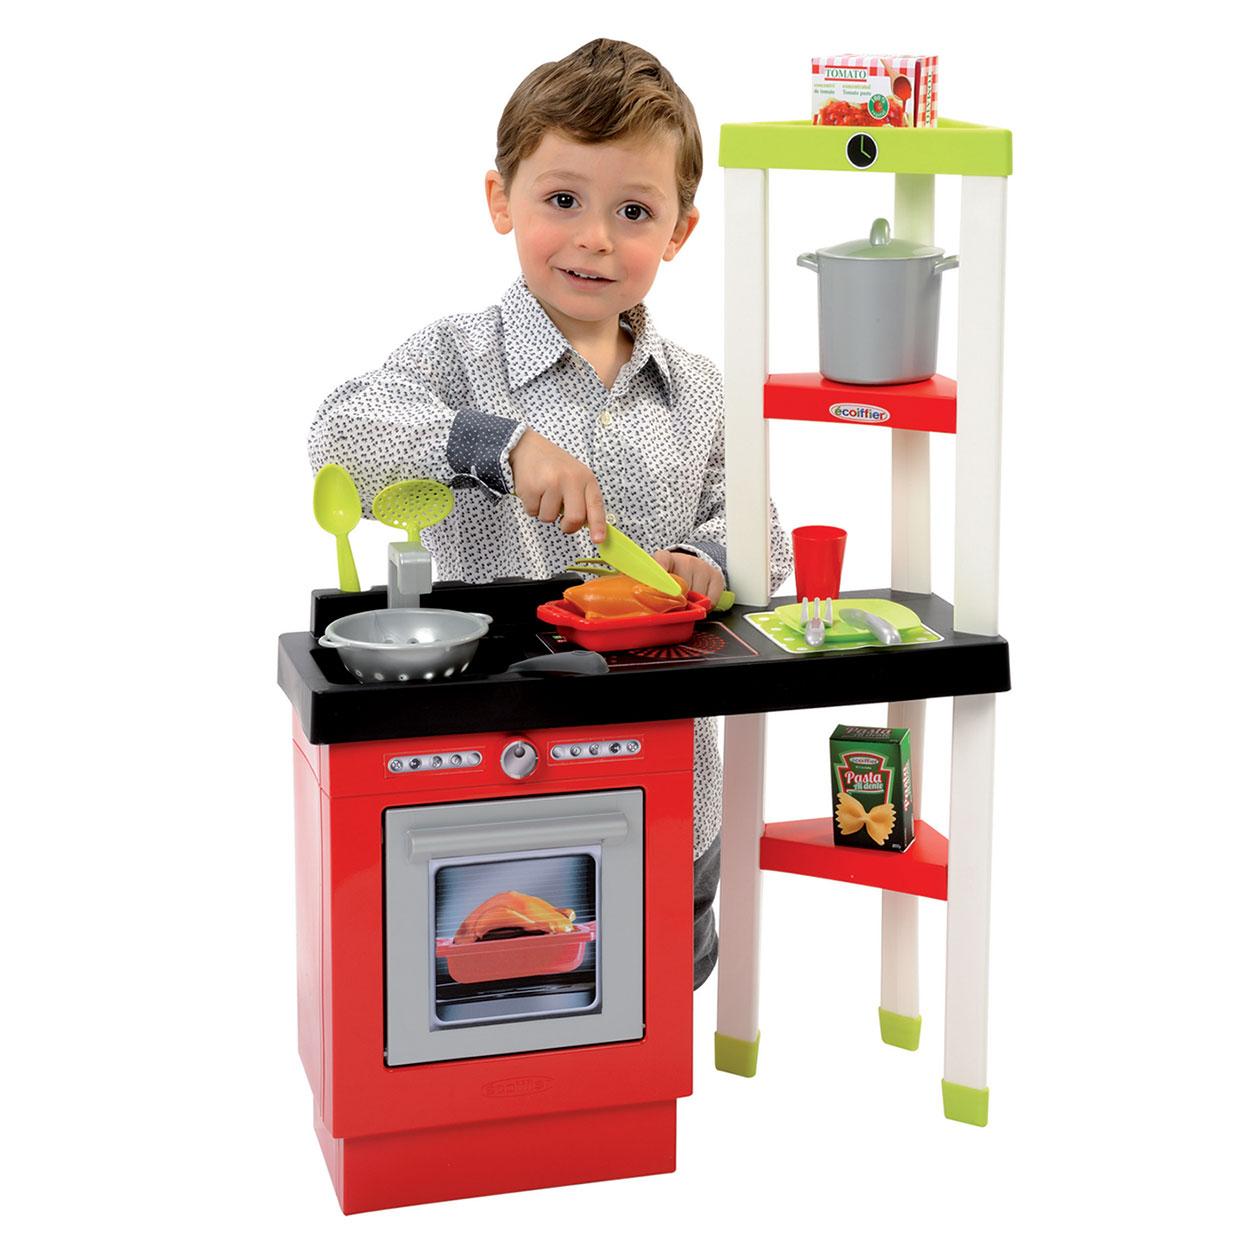 Ecoiffier Keuken Accessoires : Ecoiffier 100% Chef Keuken online kopen Lobbes nl